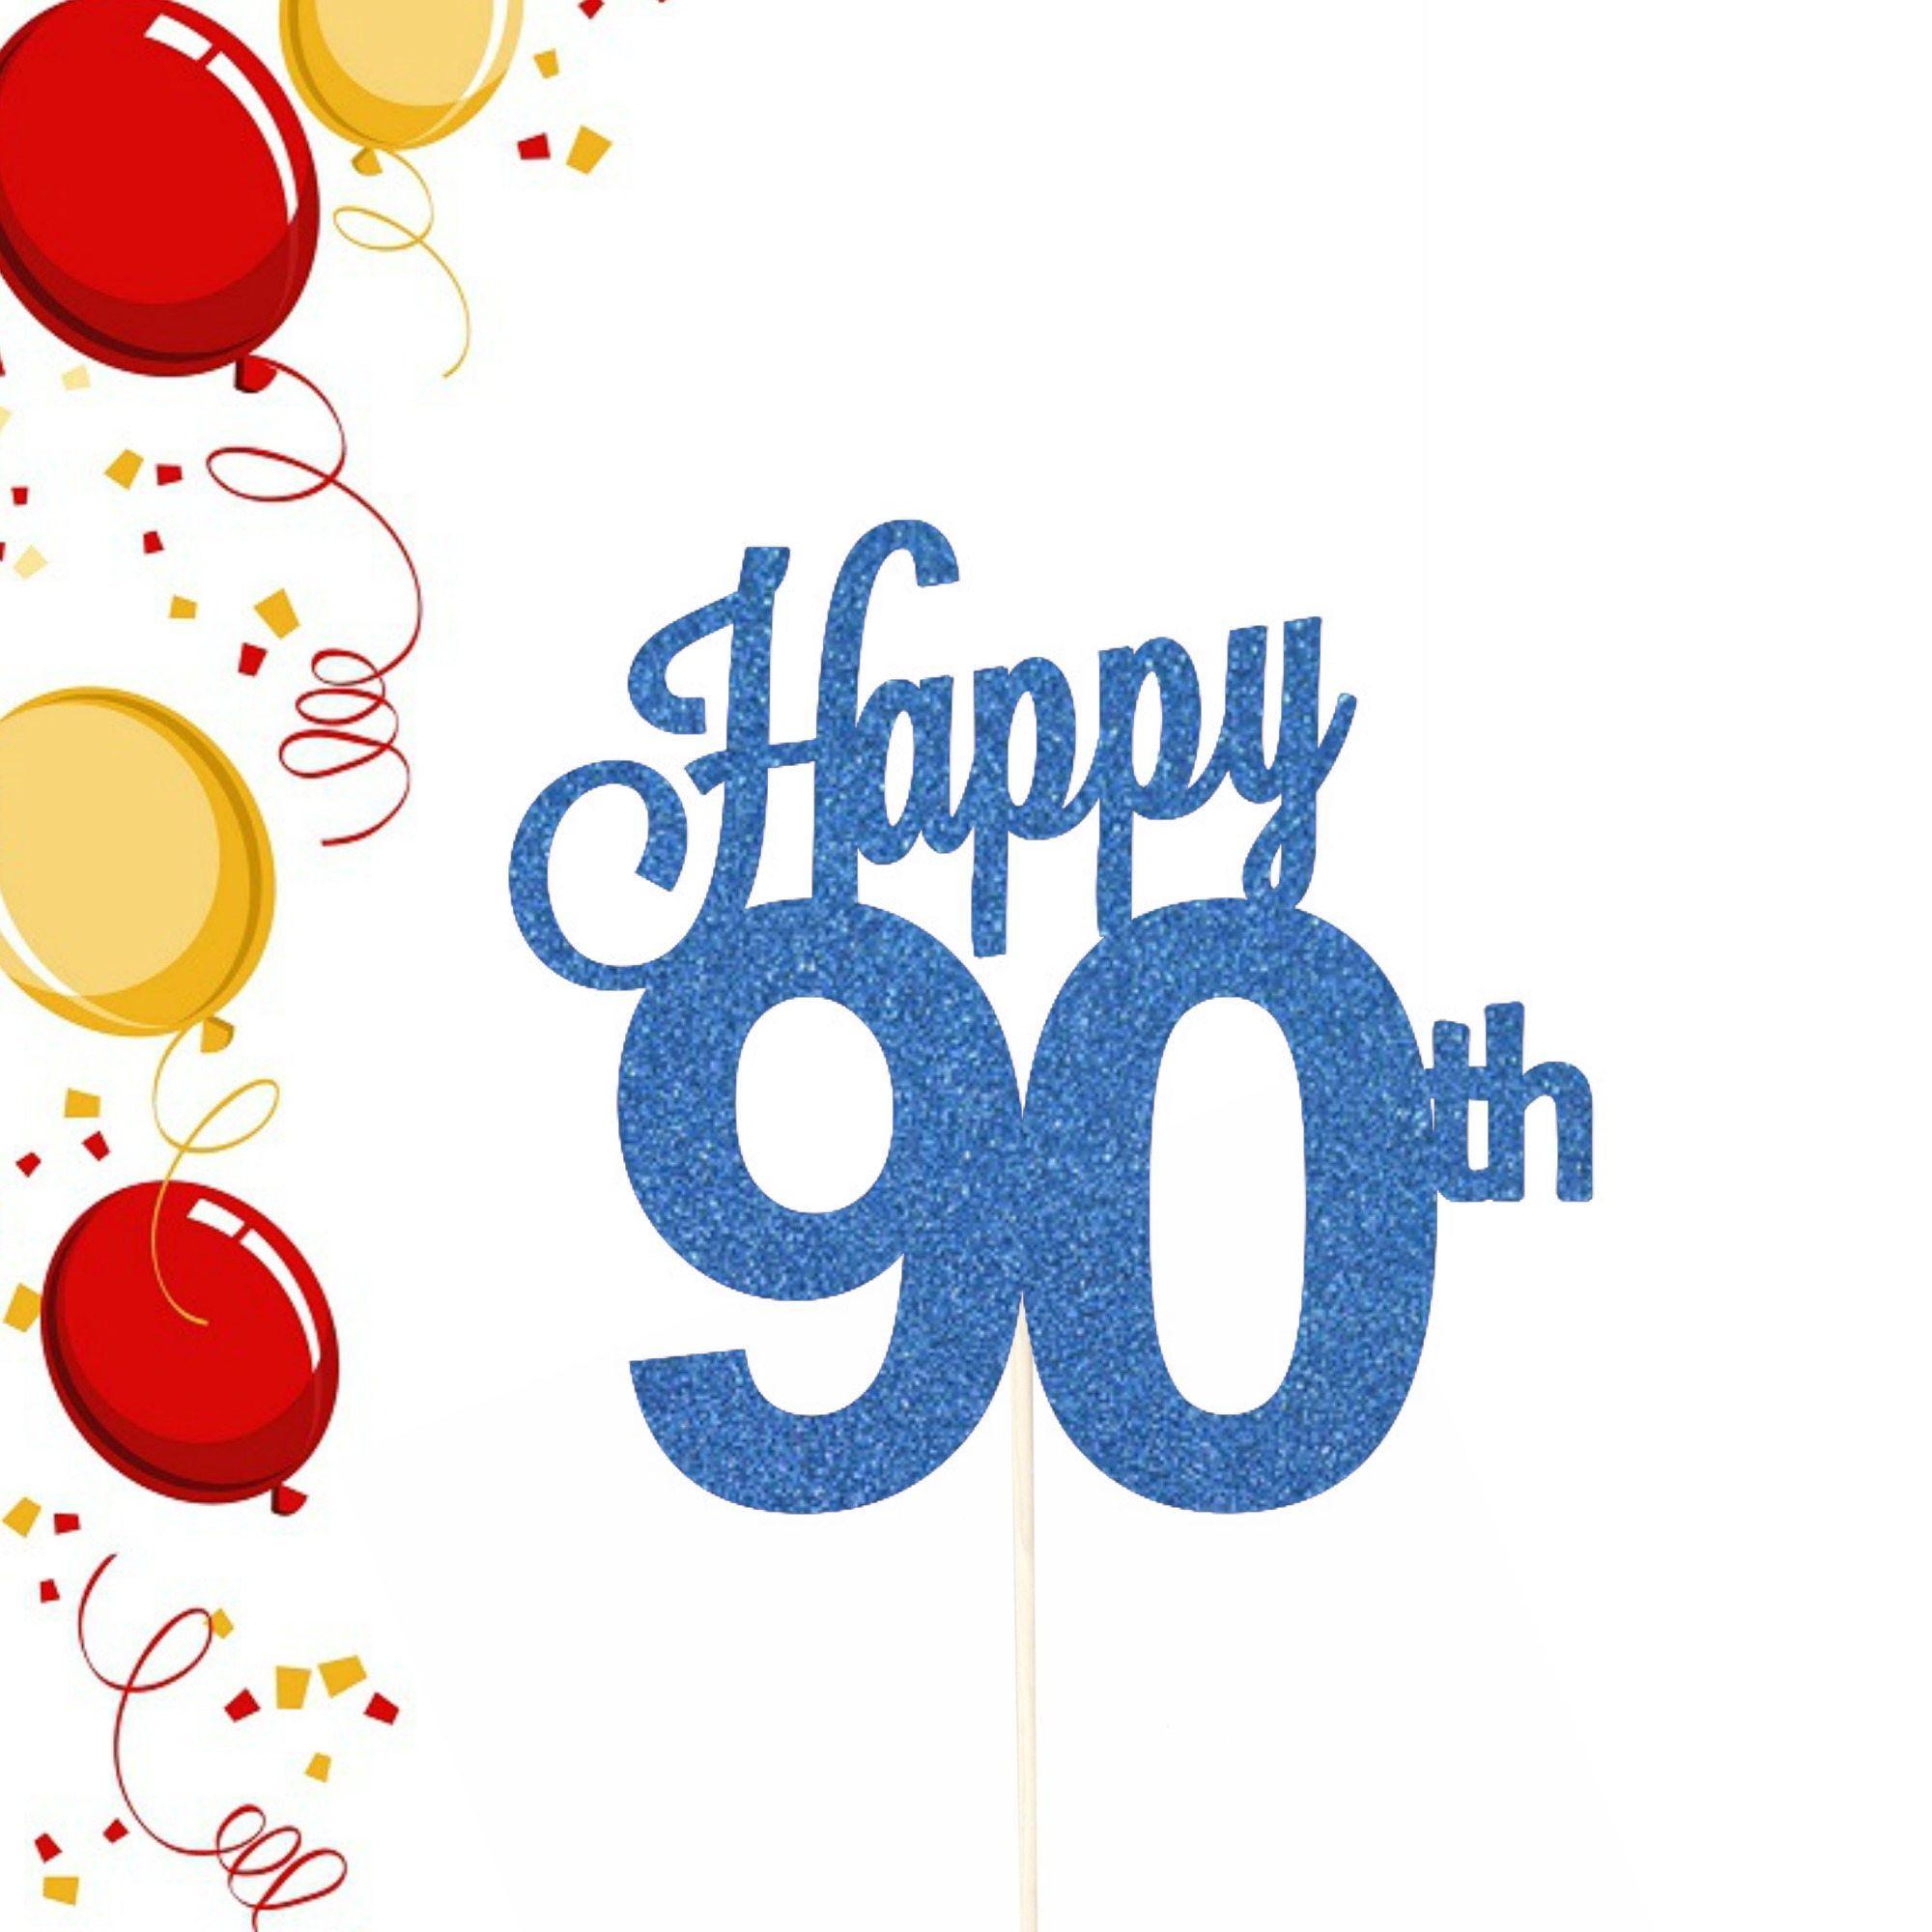 Happy 90th birthday clipart 1 » Clipart Portal.